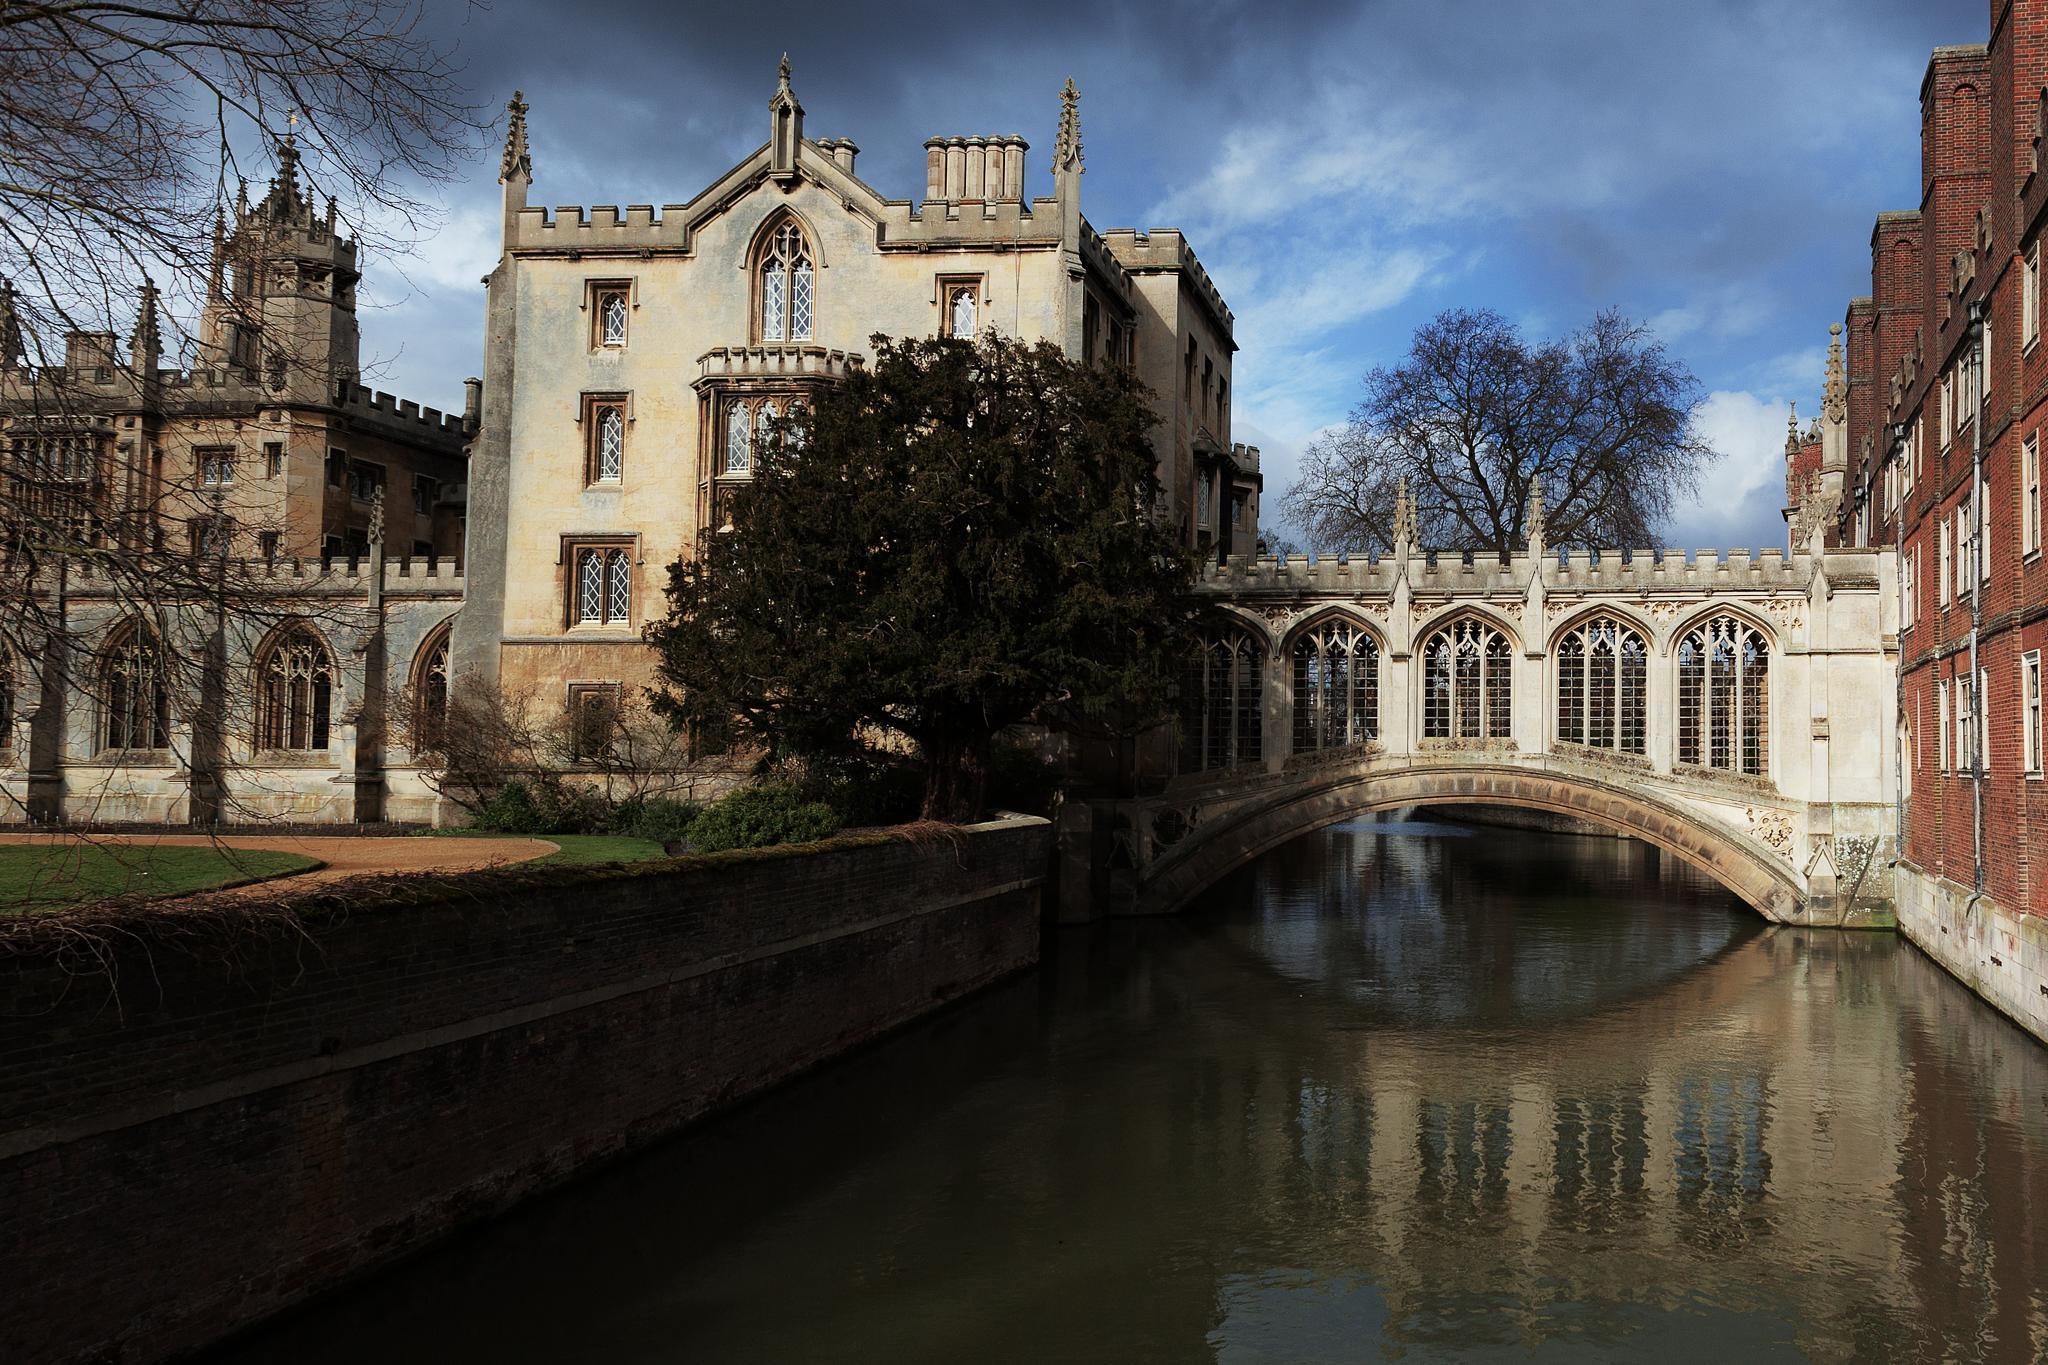 Bridge of Sighs Cambridge by Mike Howe